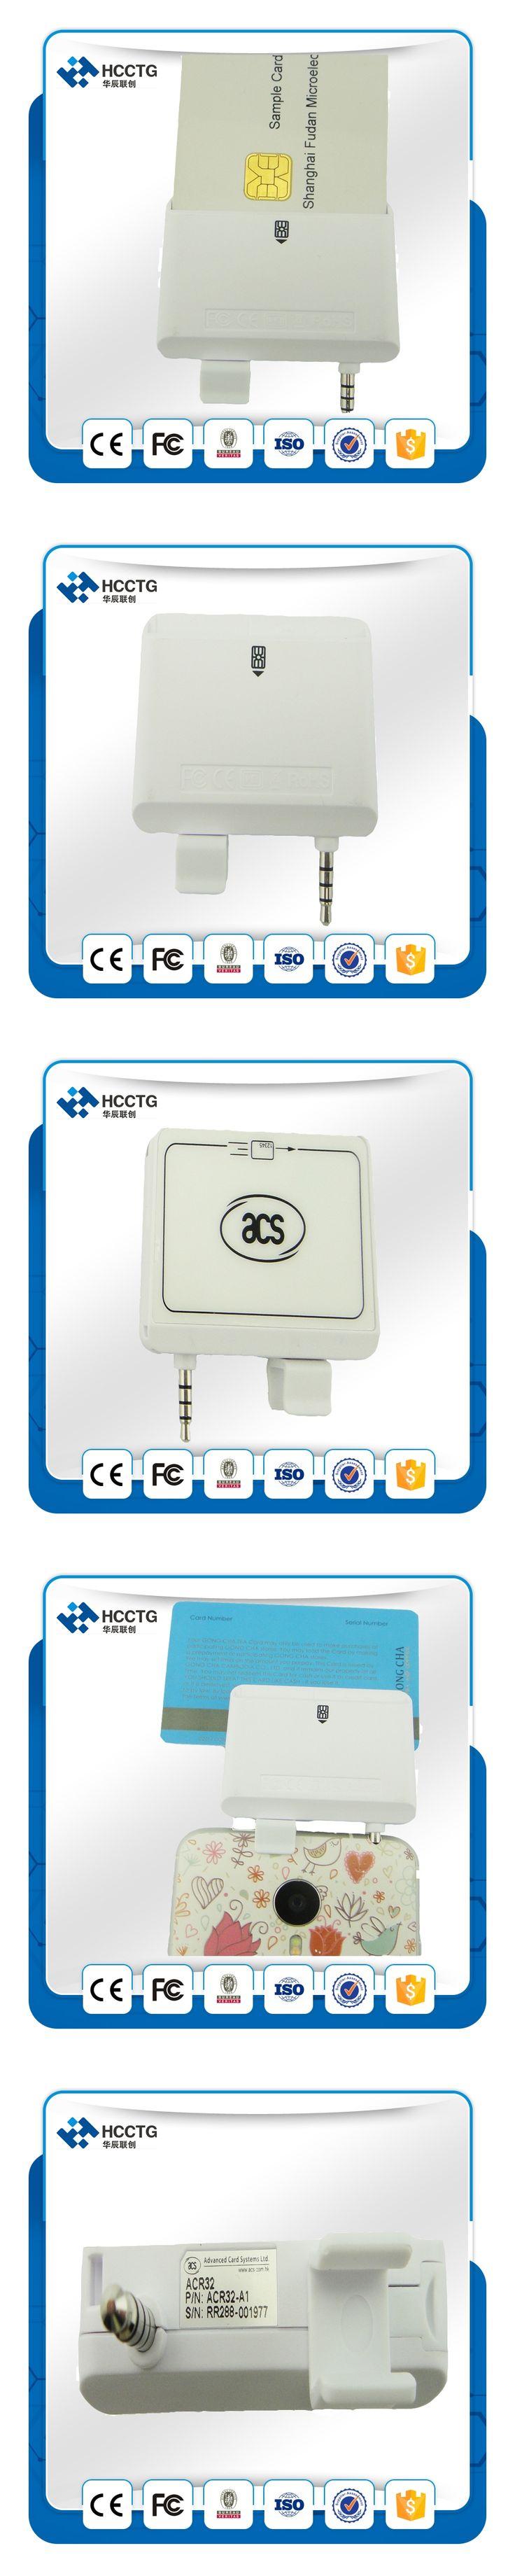 3.5mm Audio Jack Interface USB 2.0 Mobile Mate Smart Card Reader Magnetic Stripe Card Reader-ACR32